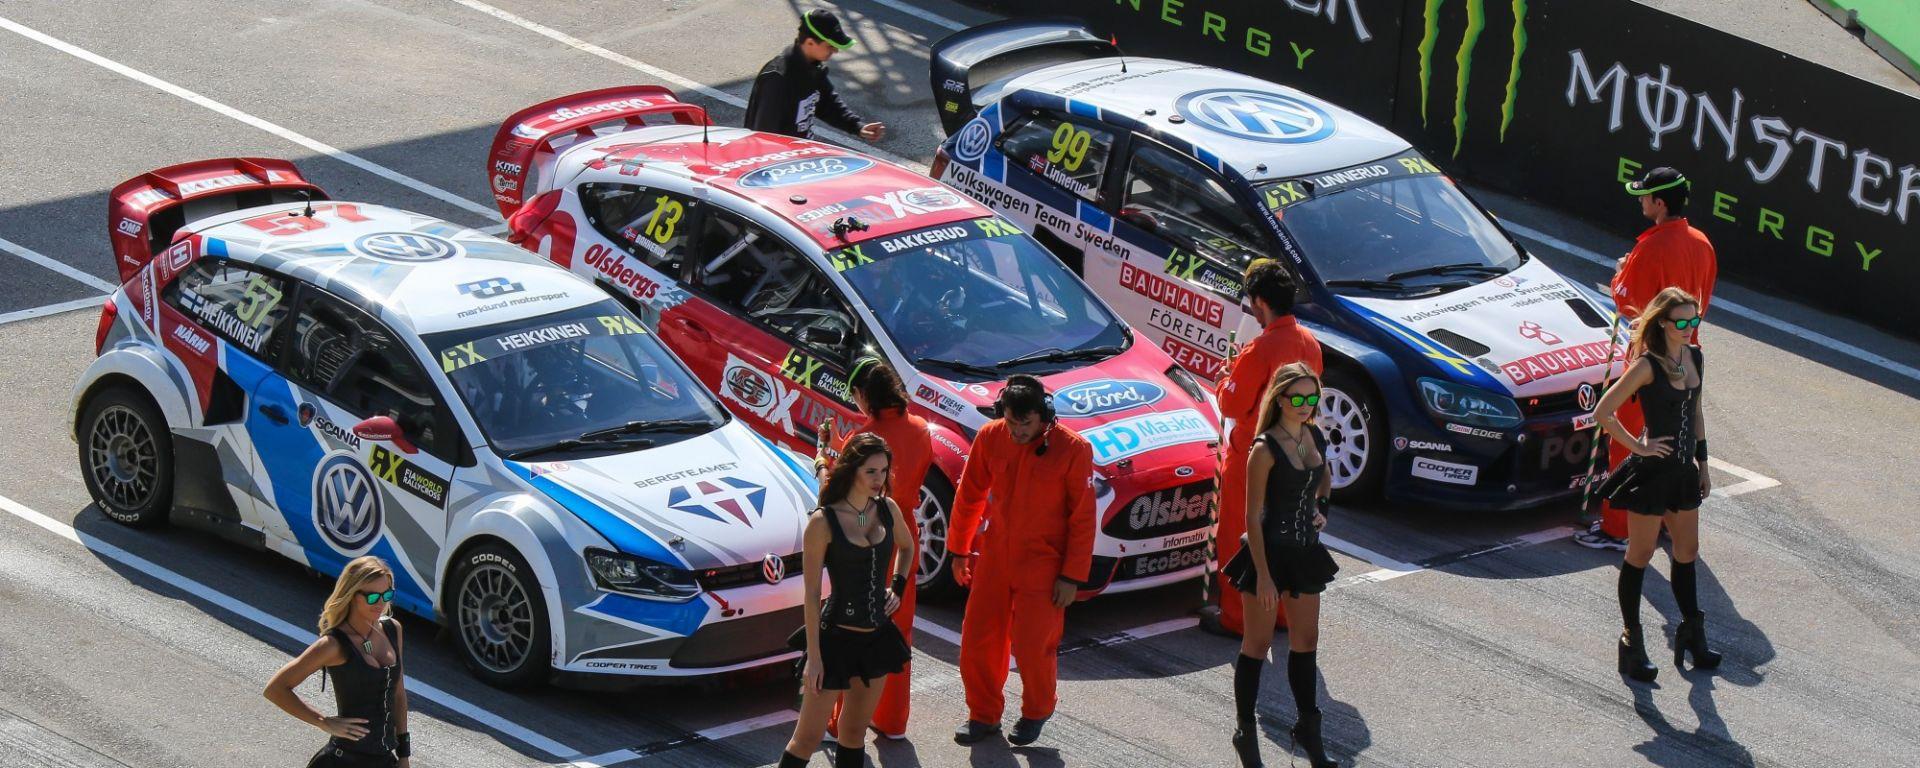 Campionato Mondiale Rallycross: il calendario 2017